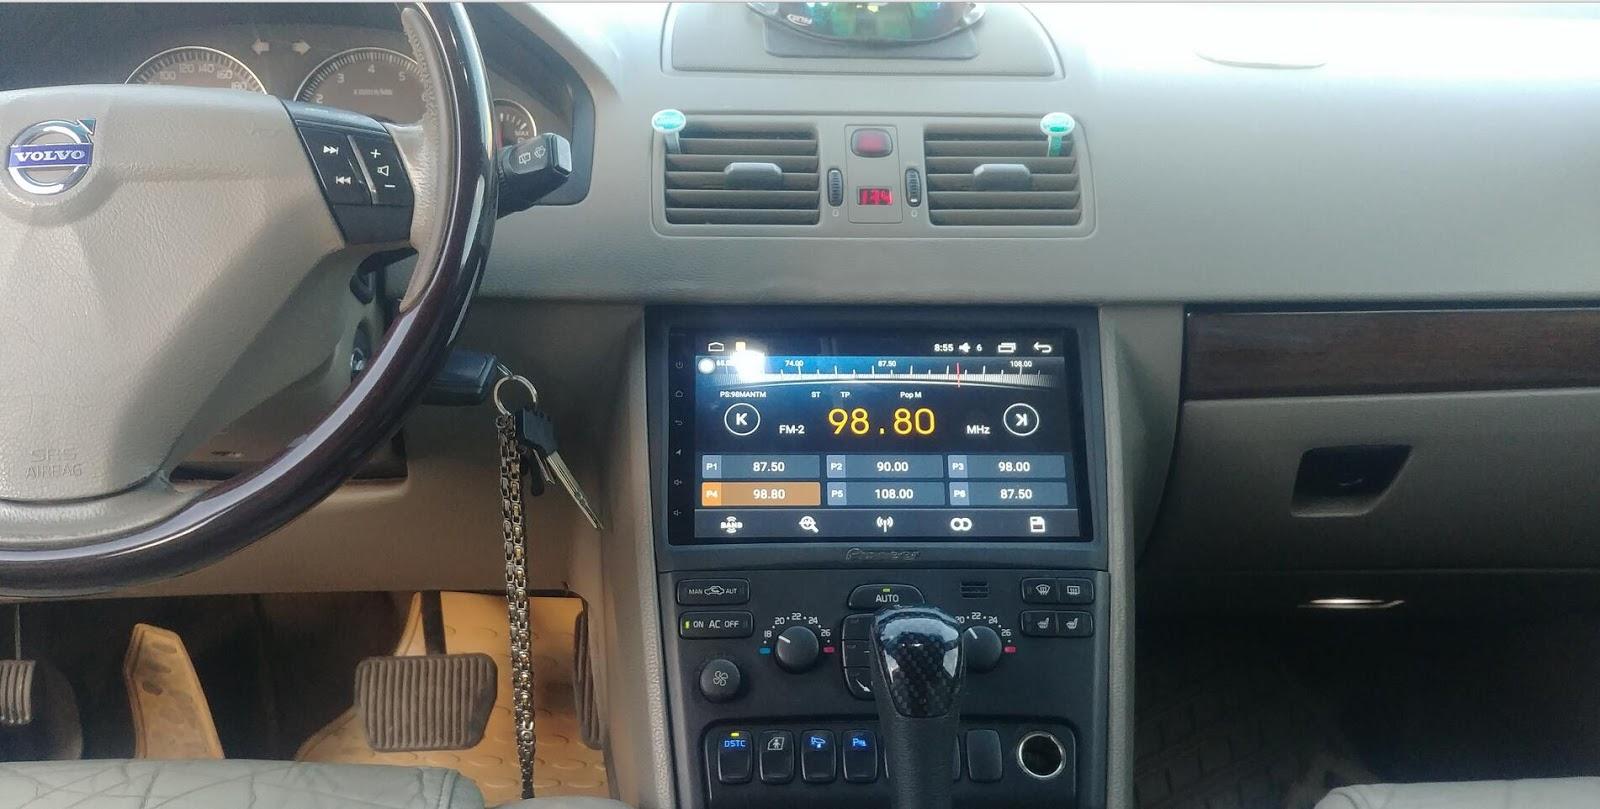 2000 Chevy Silverado Double Din